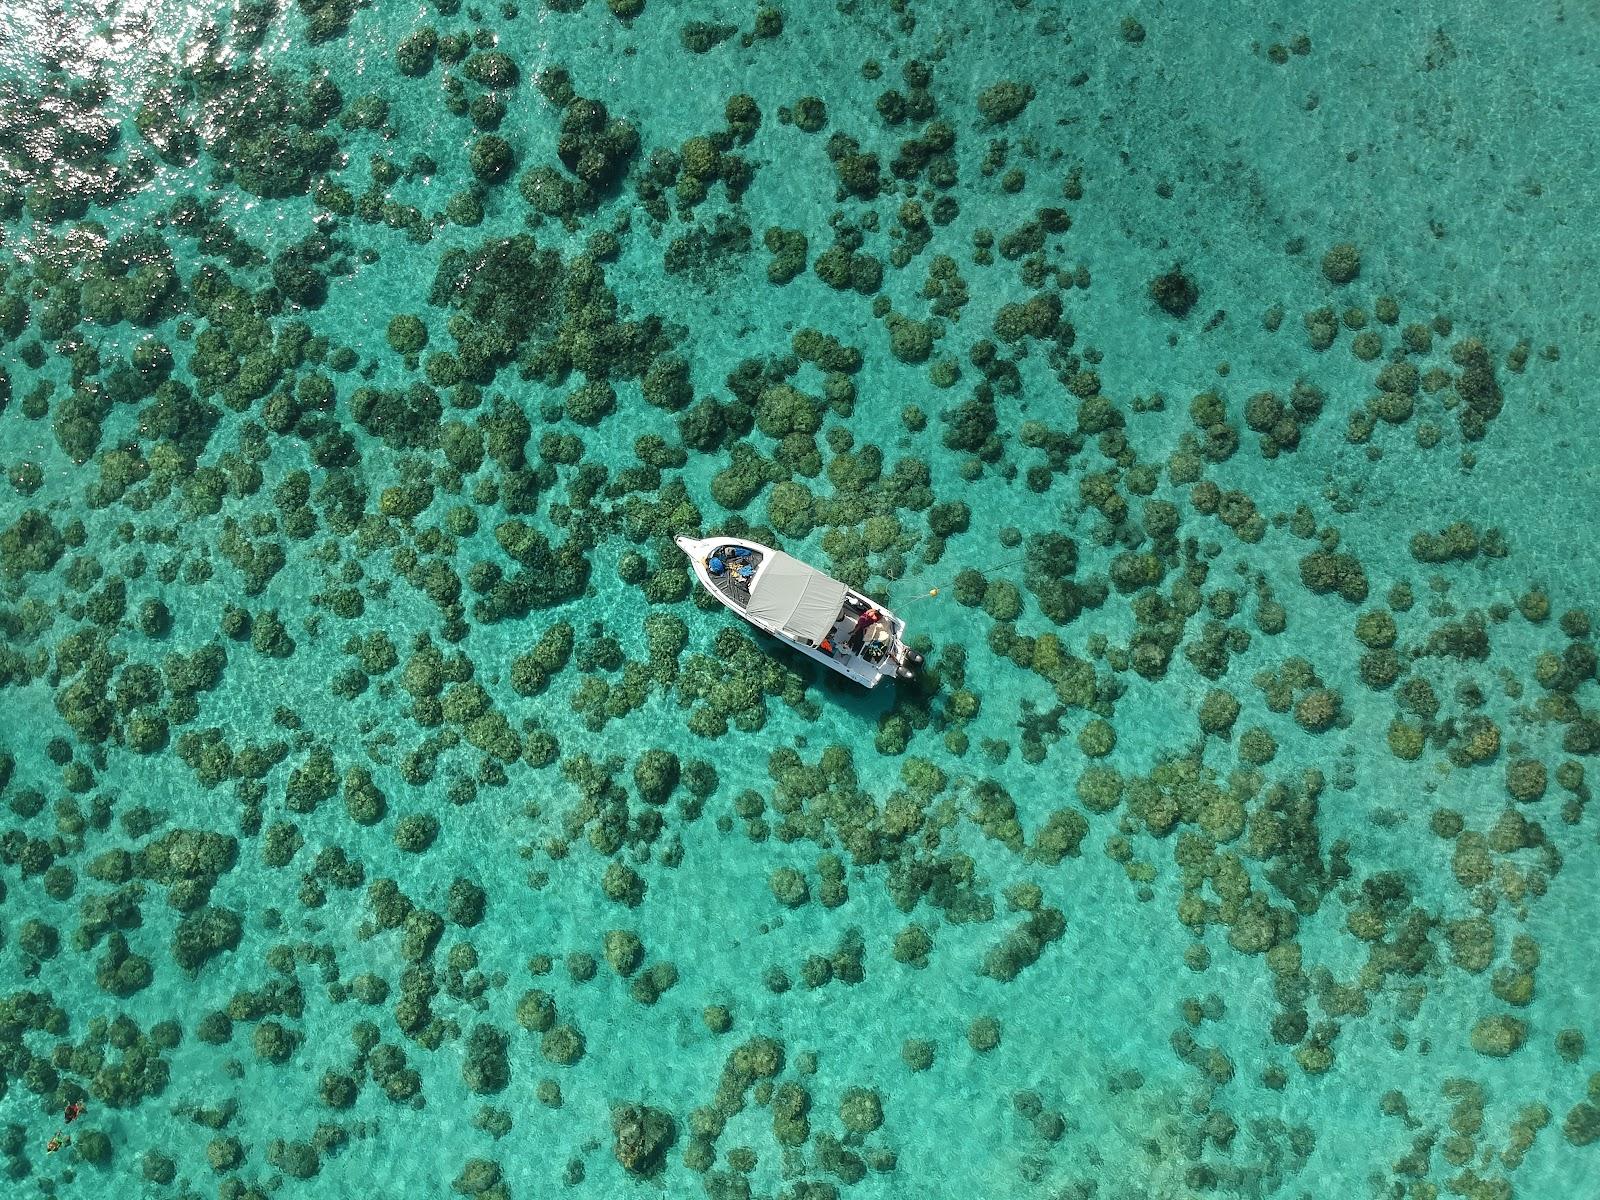 Drone shot corail